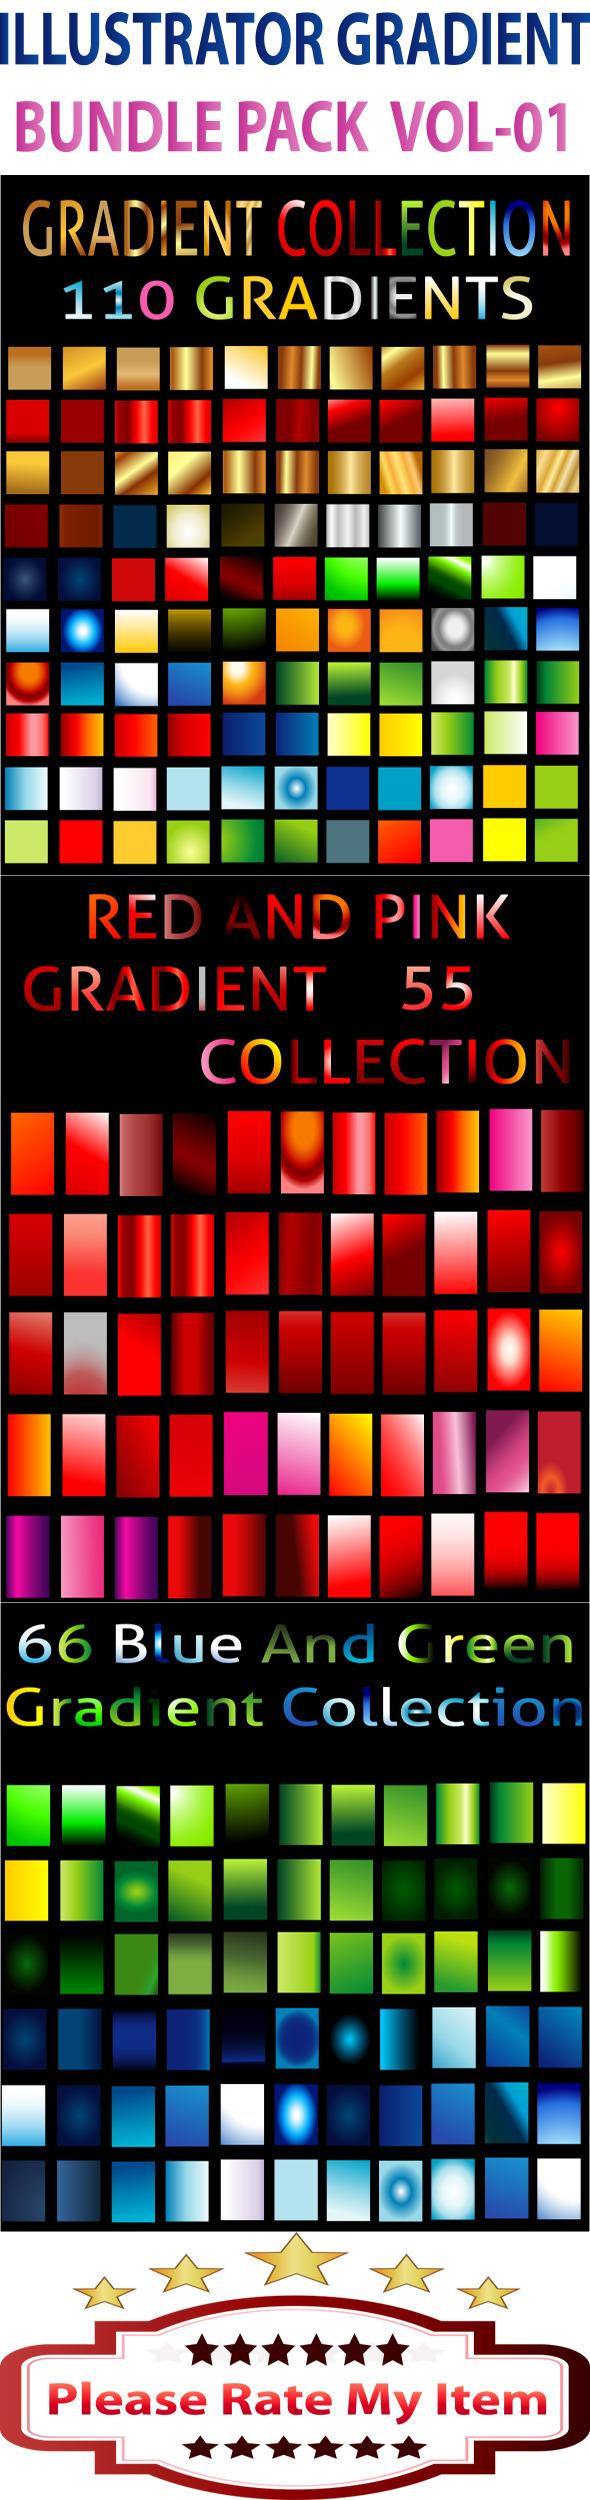 Illustrator Gradient Bundle Pack Vol-1 - Illustrator Add-ons